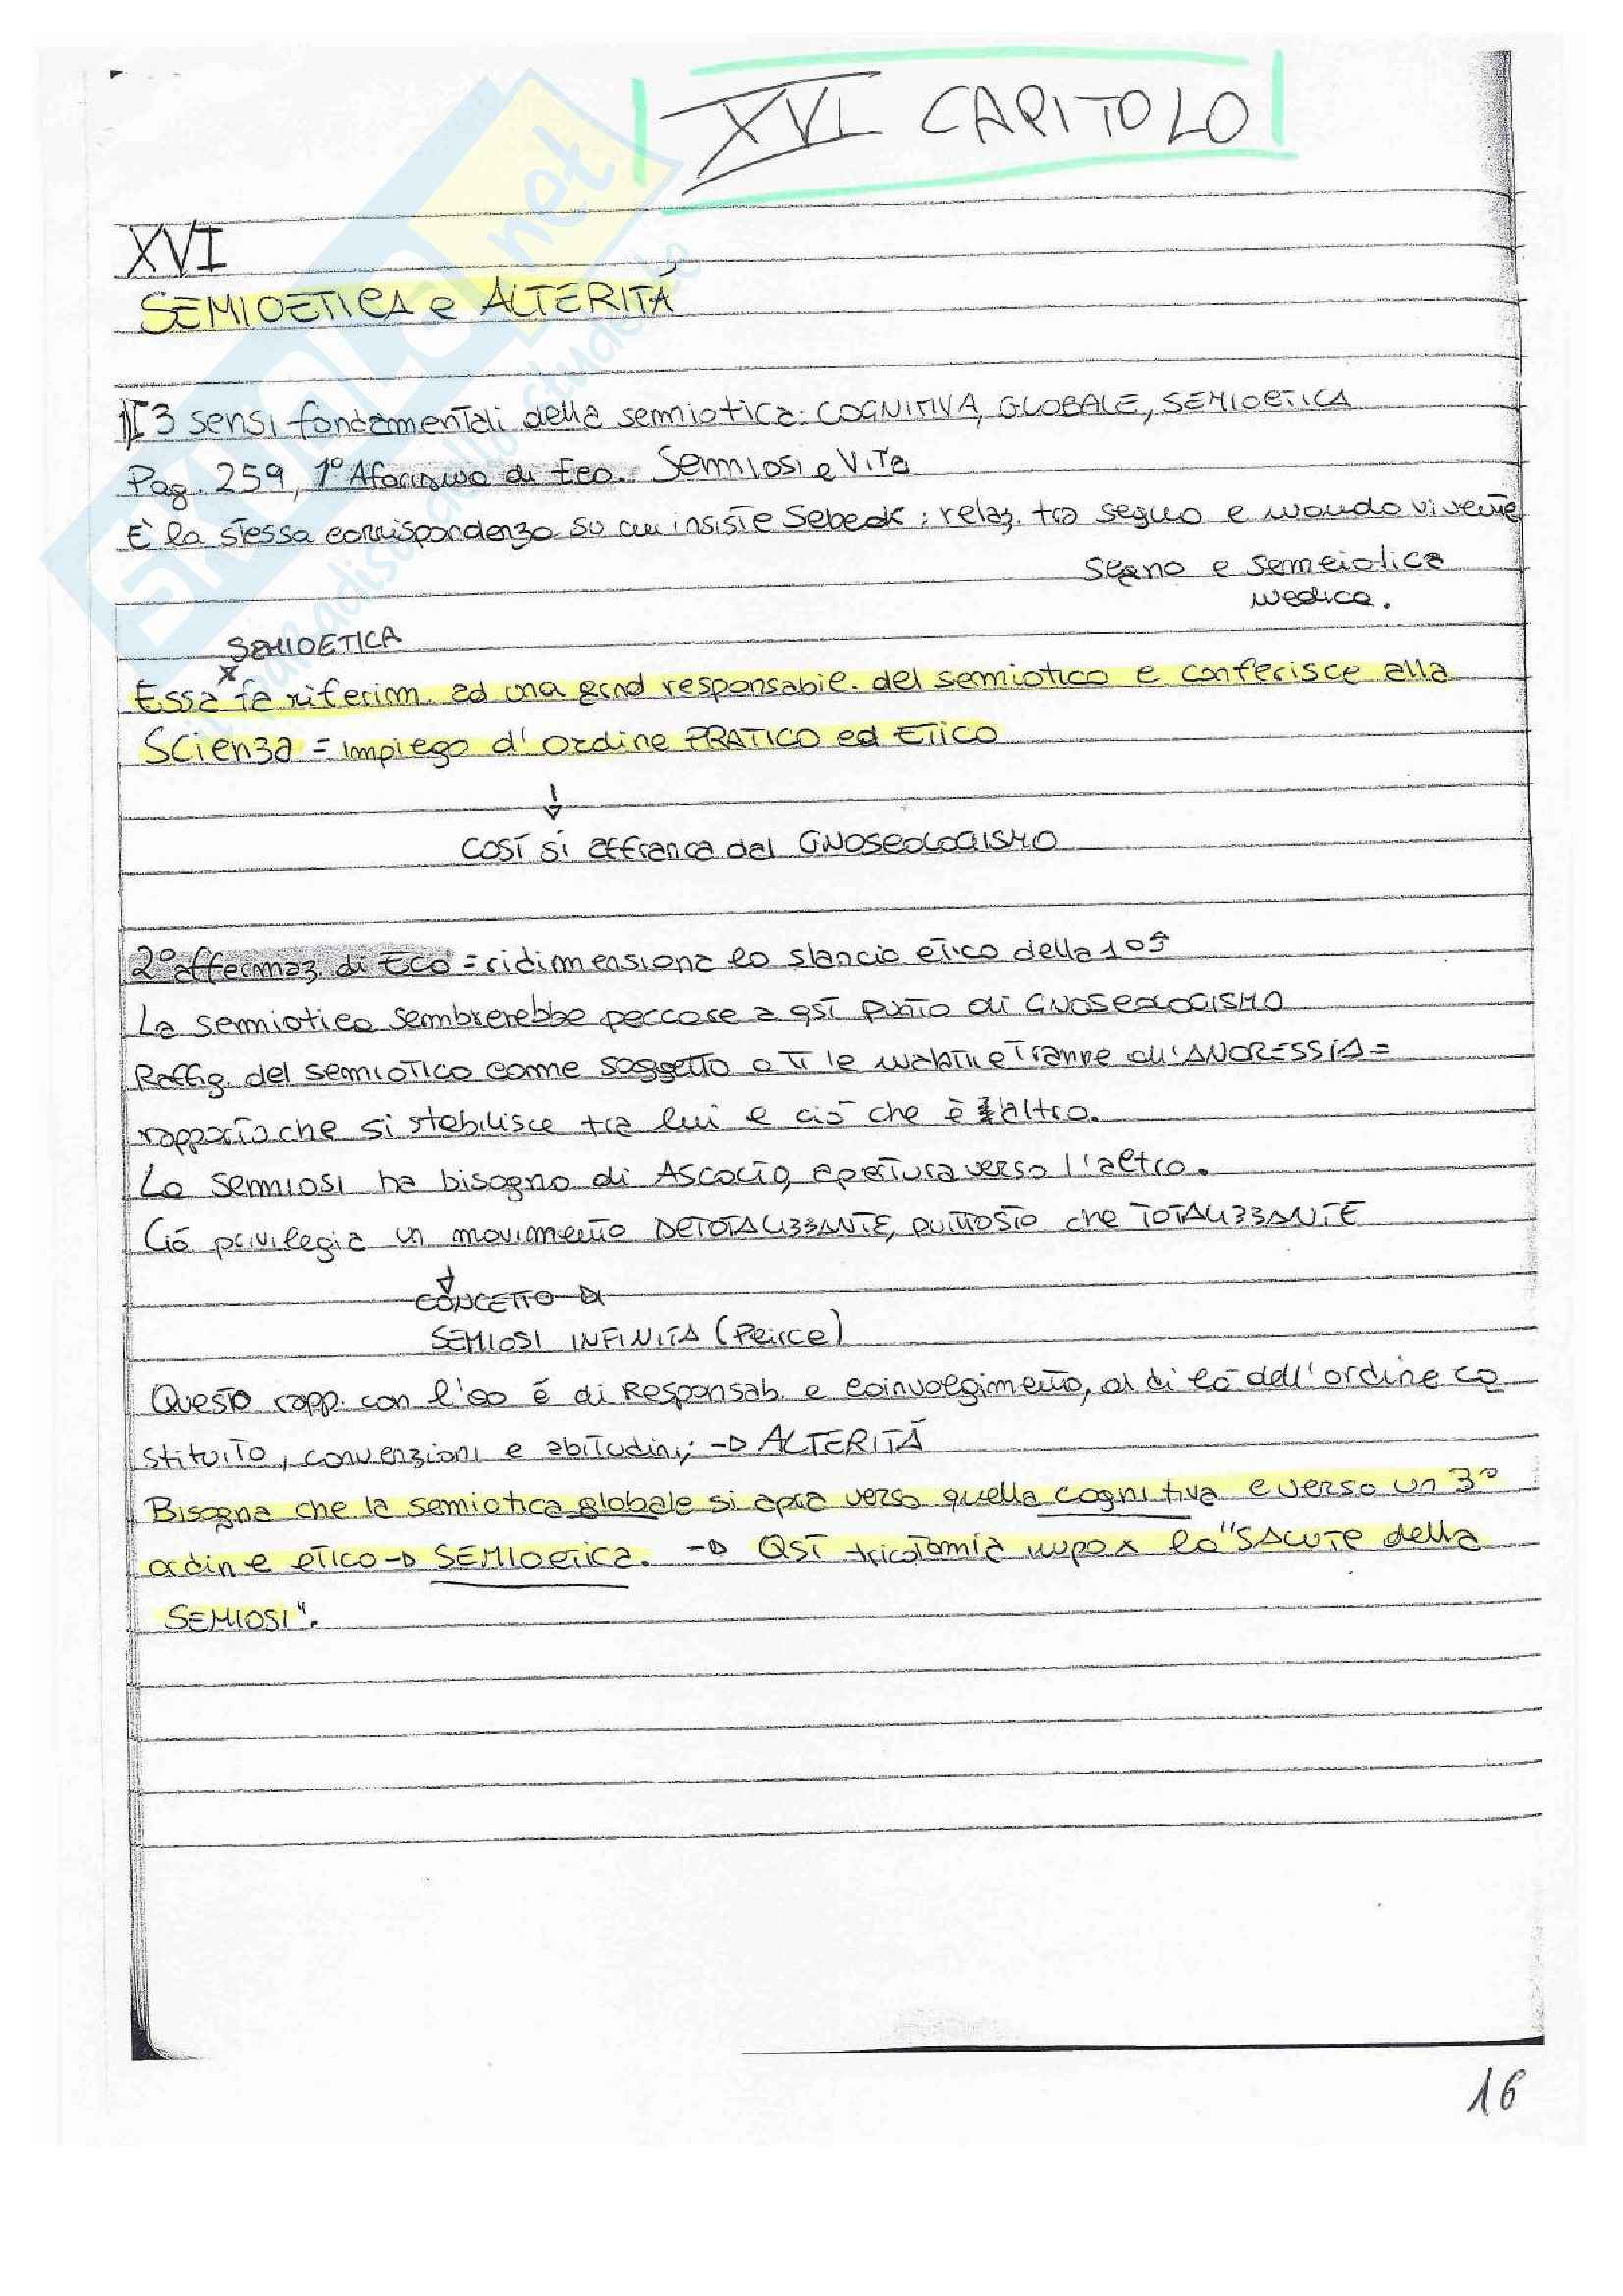 Semiotica, Appunti Pag. 16